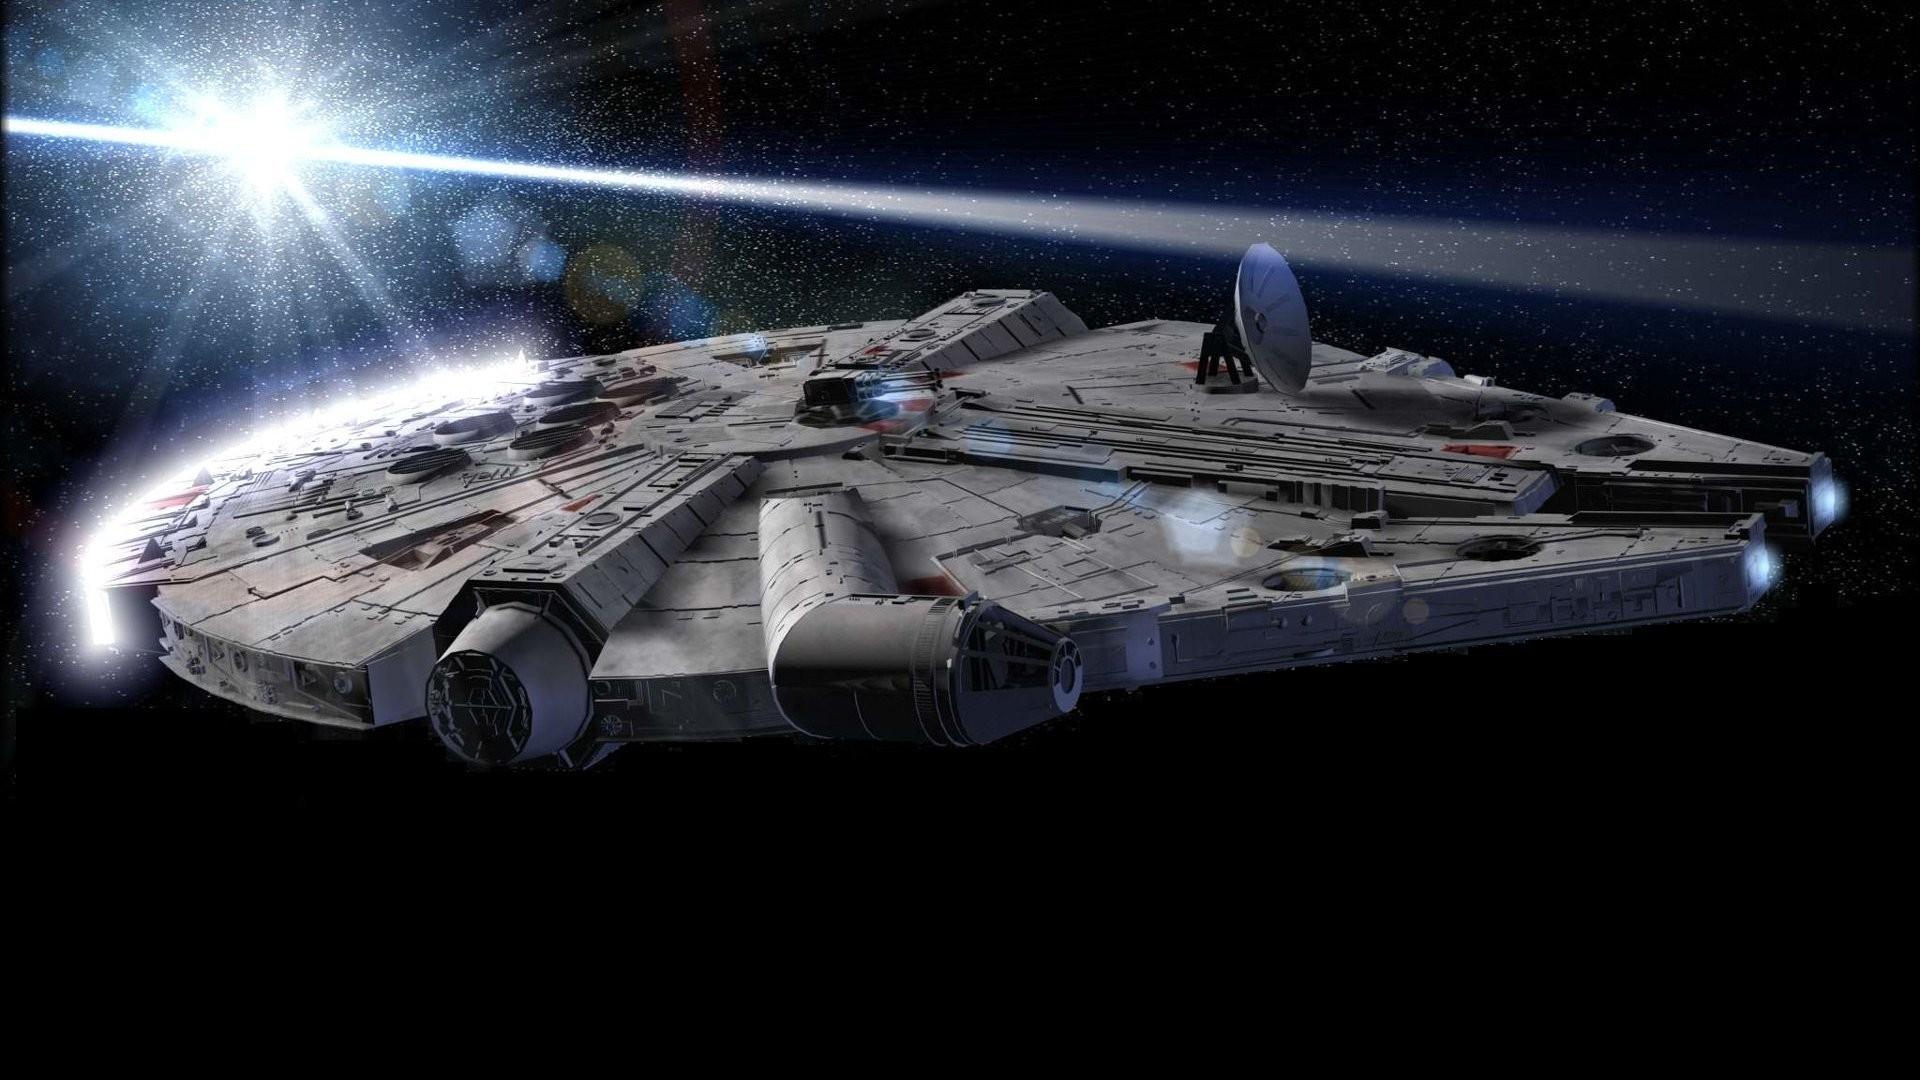 STAR WARS X -WING spaceship futuristic space sci-fi xwing wallpaper |  | 811209 | WallpaperUP